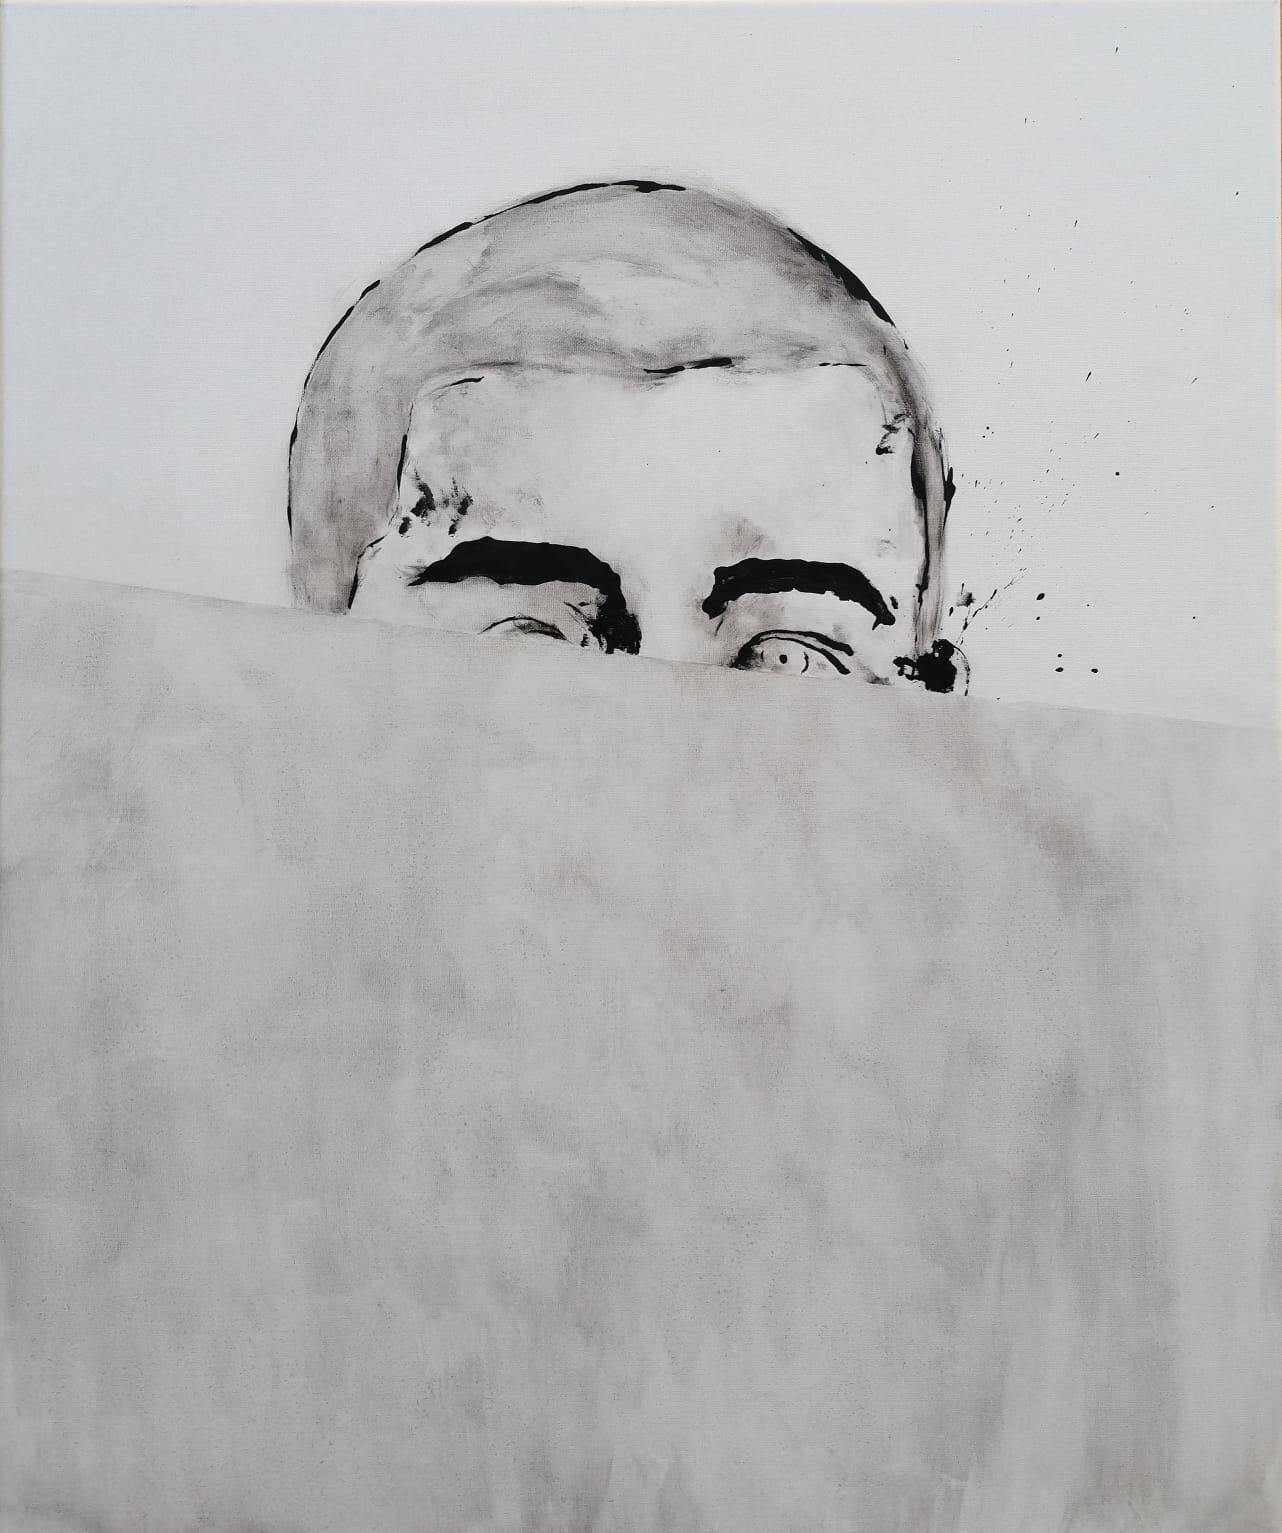 SANF050 Naoki Fuku, Peeping Boy B, ink, acyrlic and graphite on canvas, 50x60cm, 2019.jpg